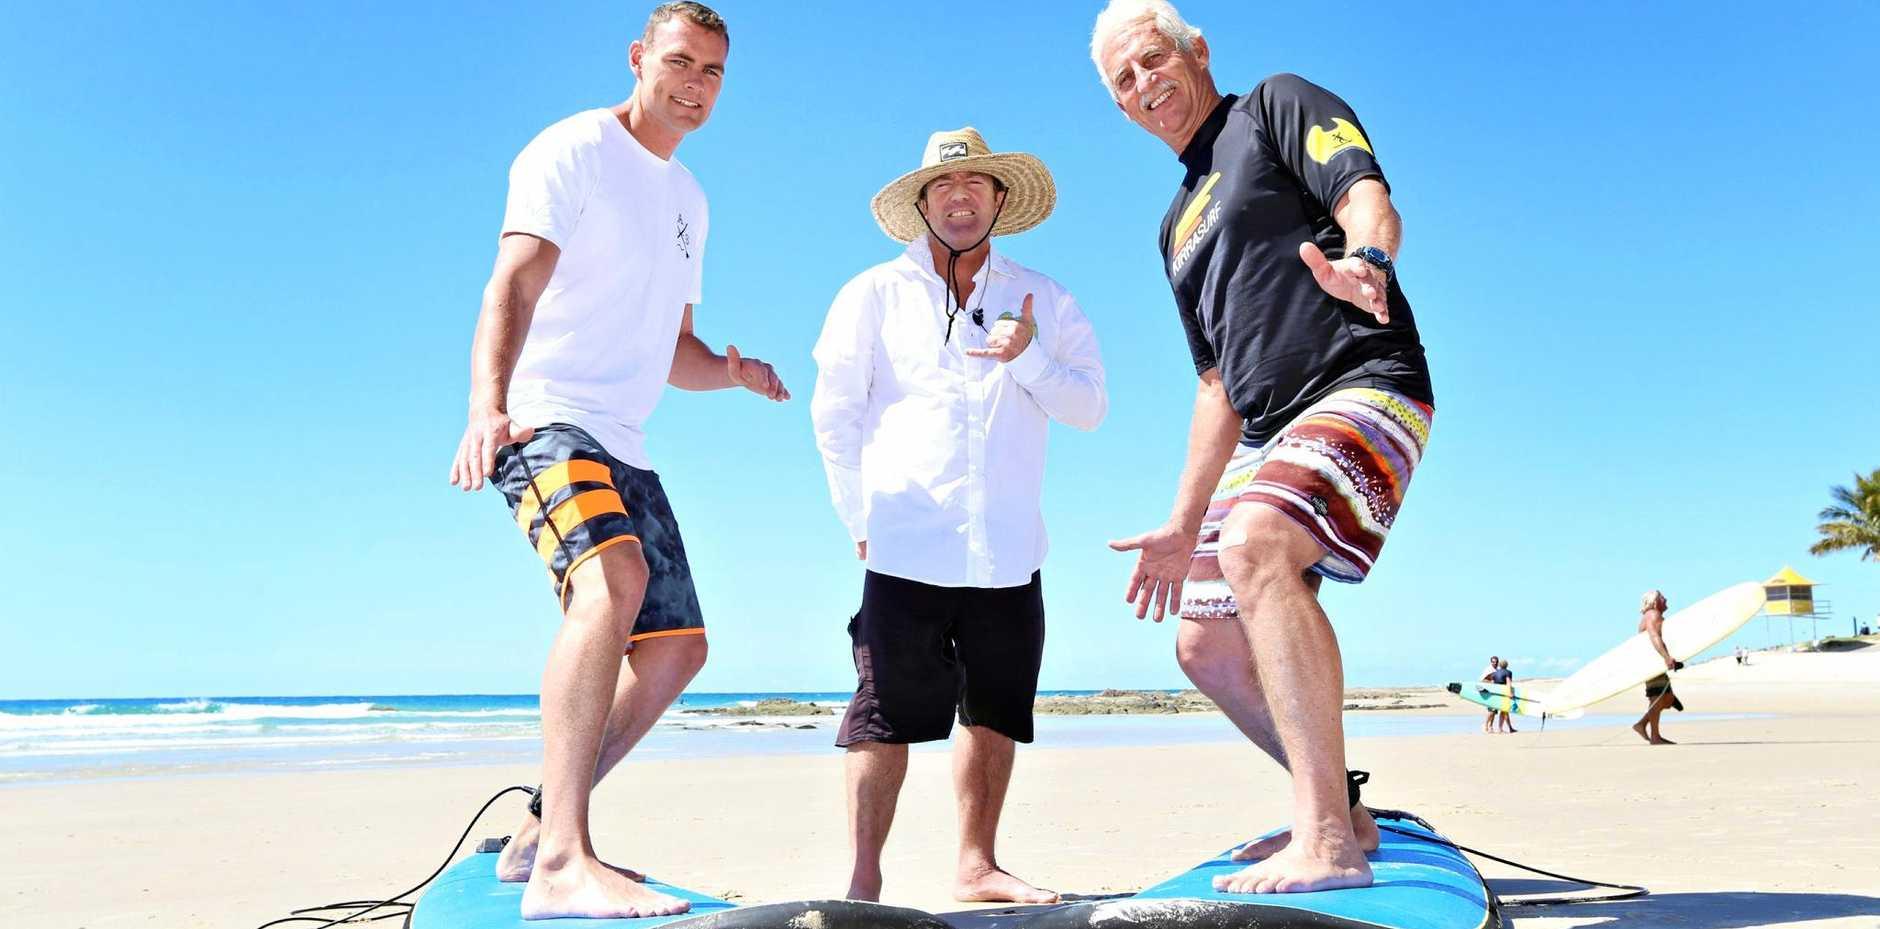 Glenn Filtness, surf instructor Dave Davidson, and Ken Campbell hit the beach ahead of Veterans' Health Week.